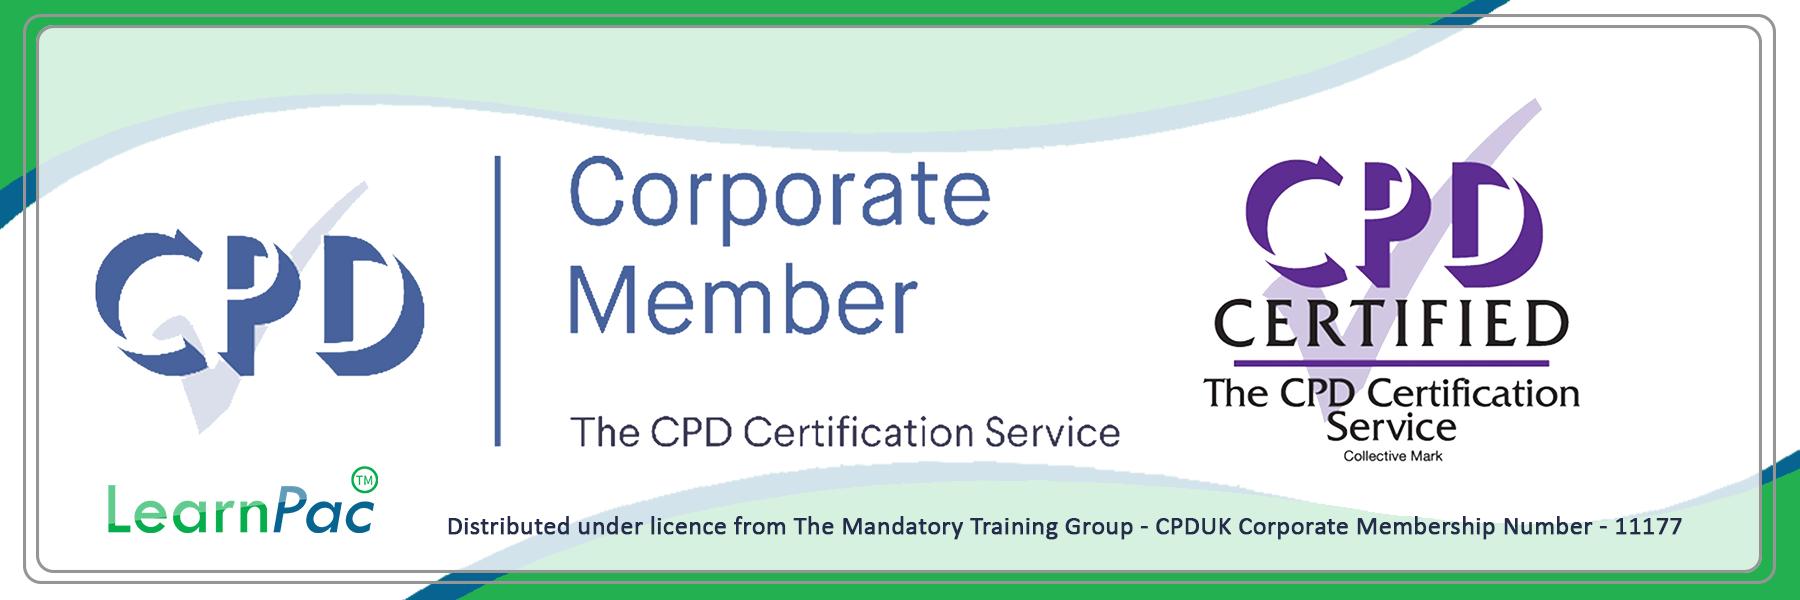 Care Certificate Standard 4 - CPDUK Certified - Learnpac System UK -